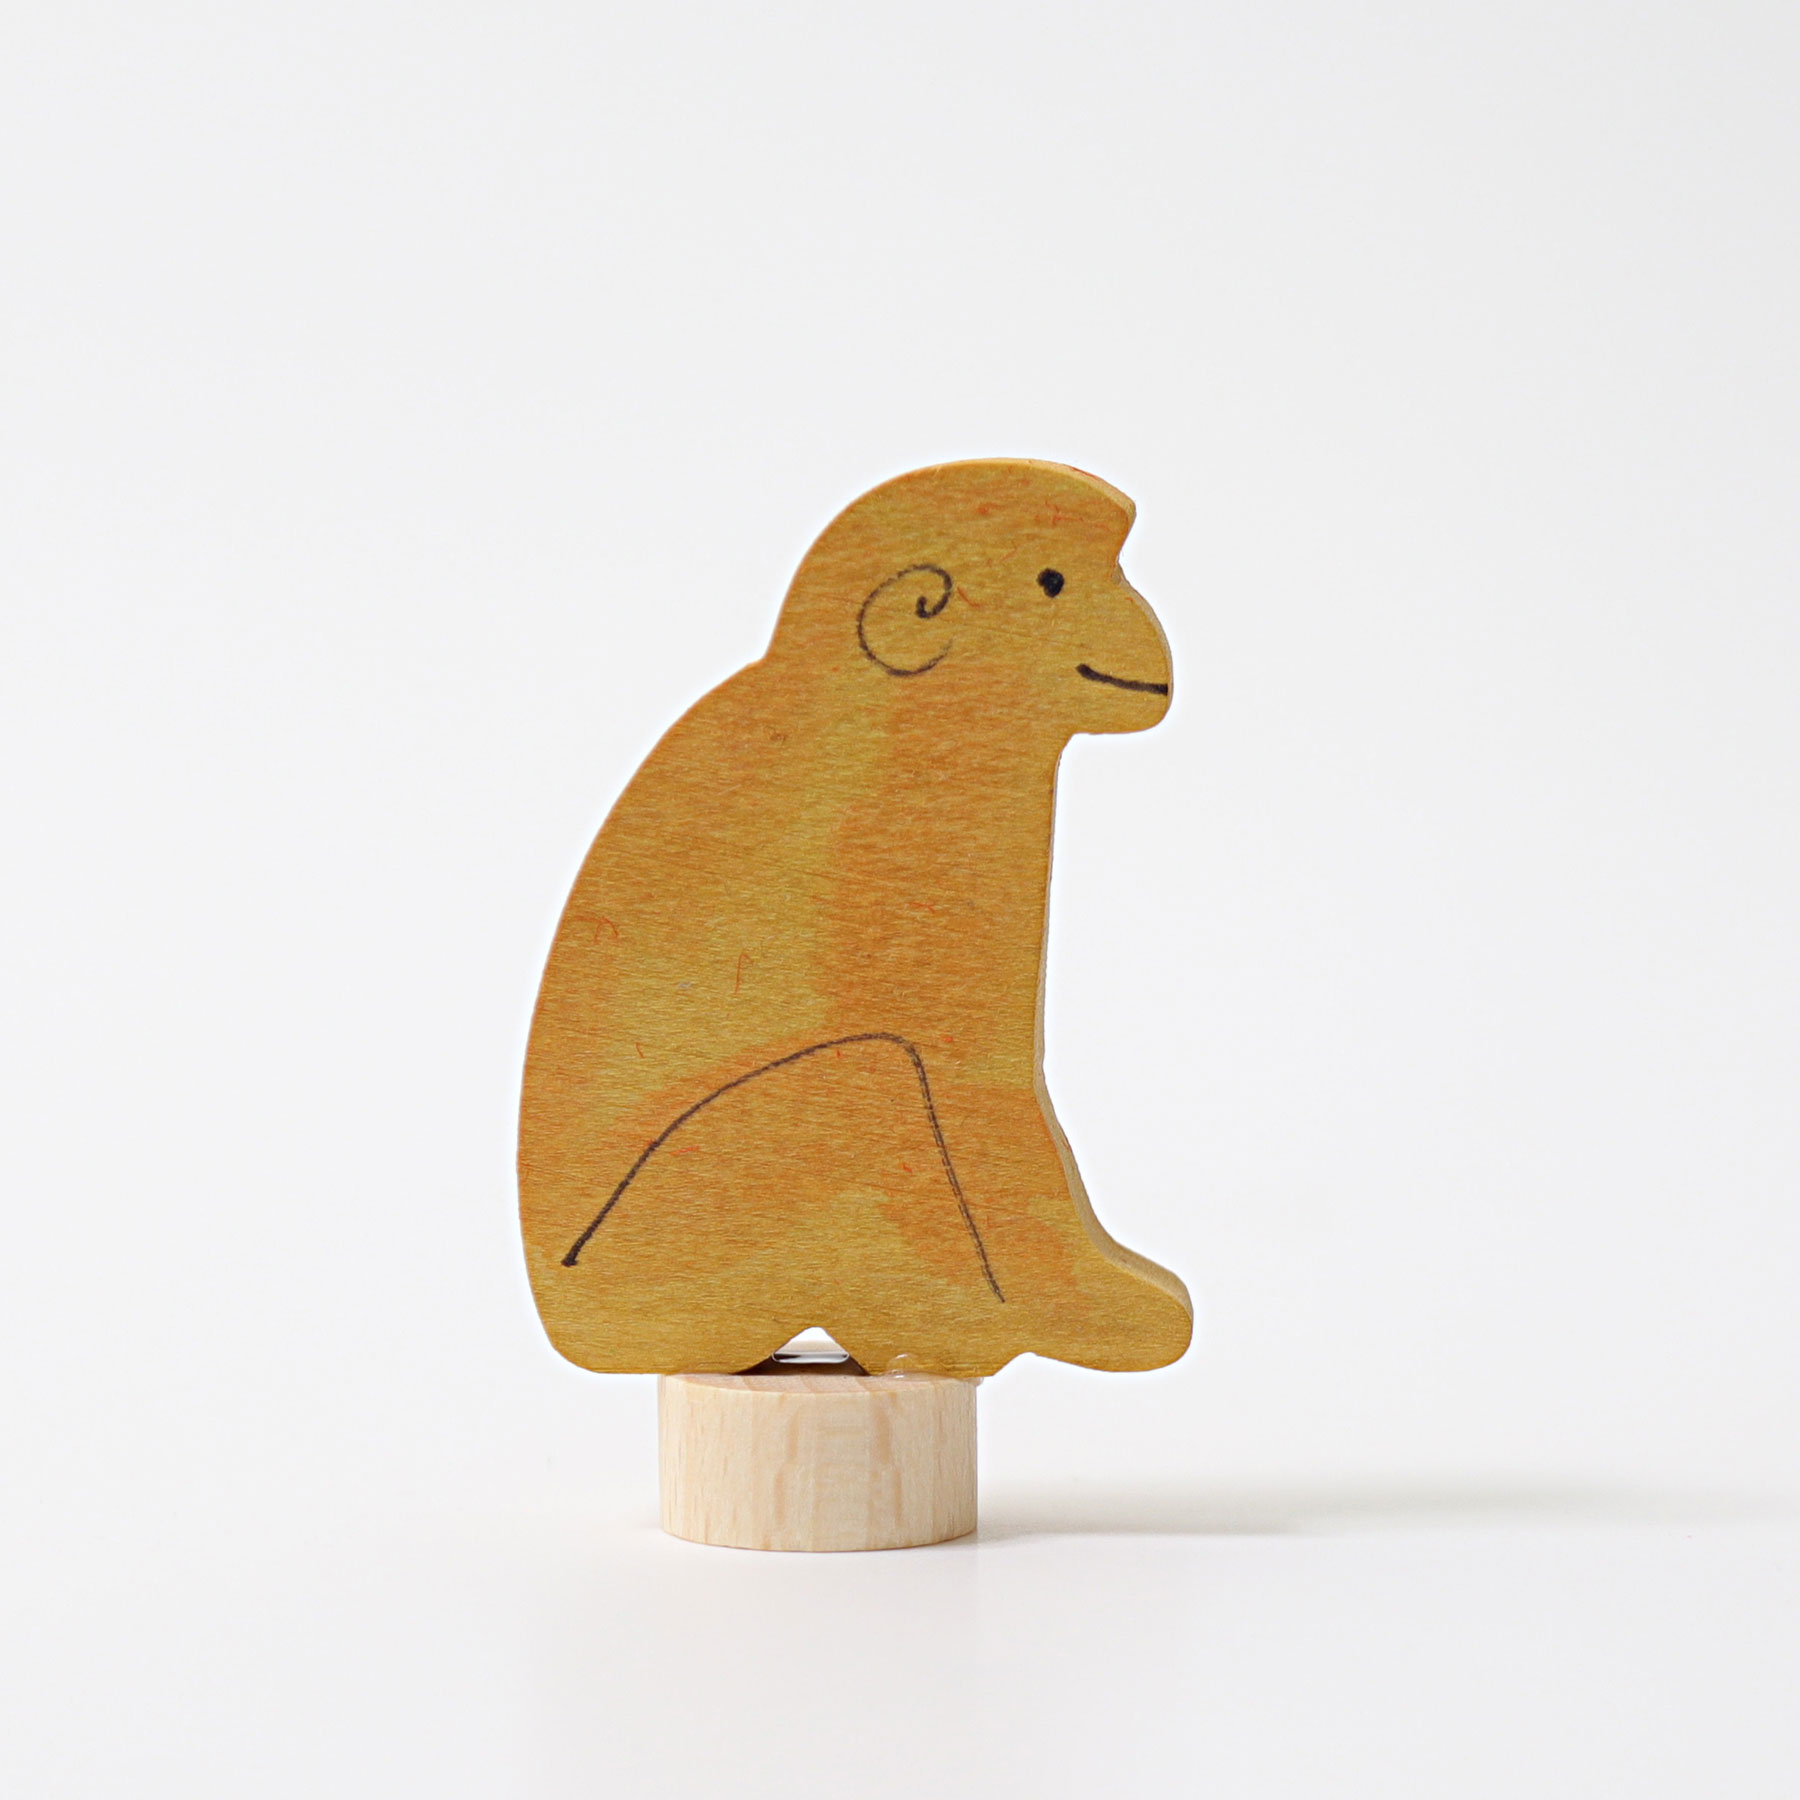 Macaco Sentado - Figura Decorativa - Grimm's